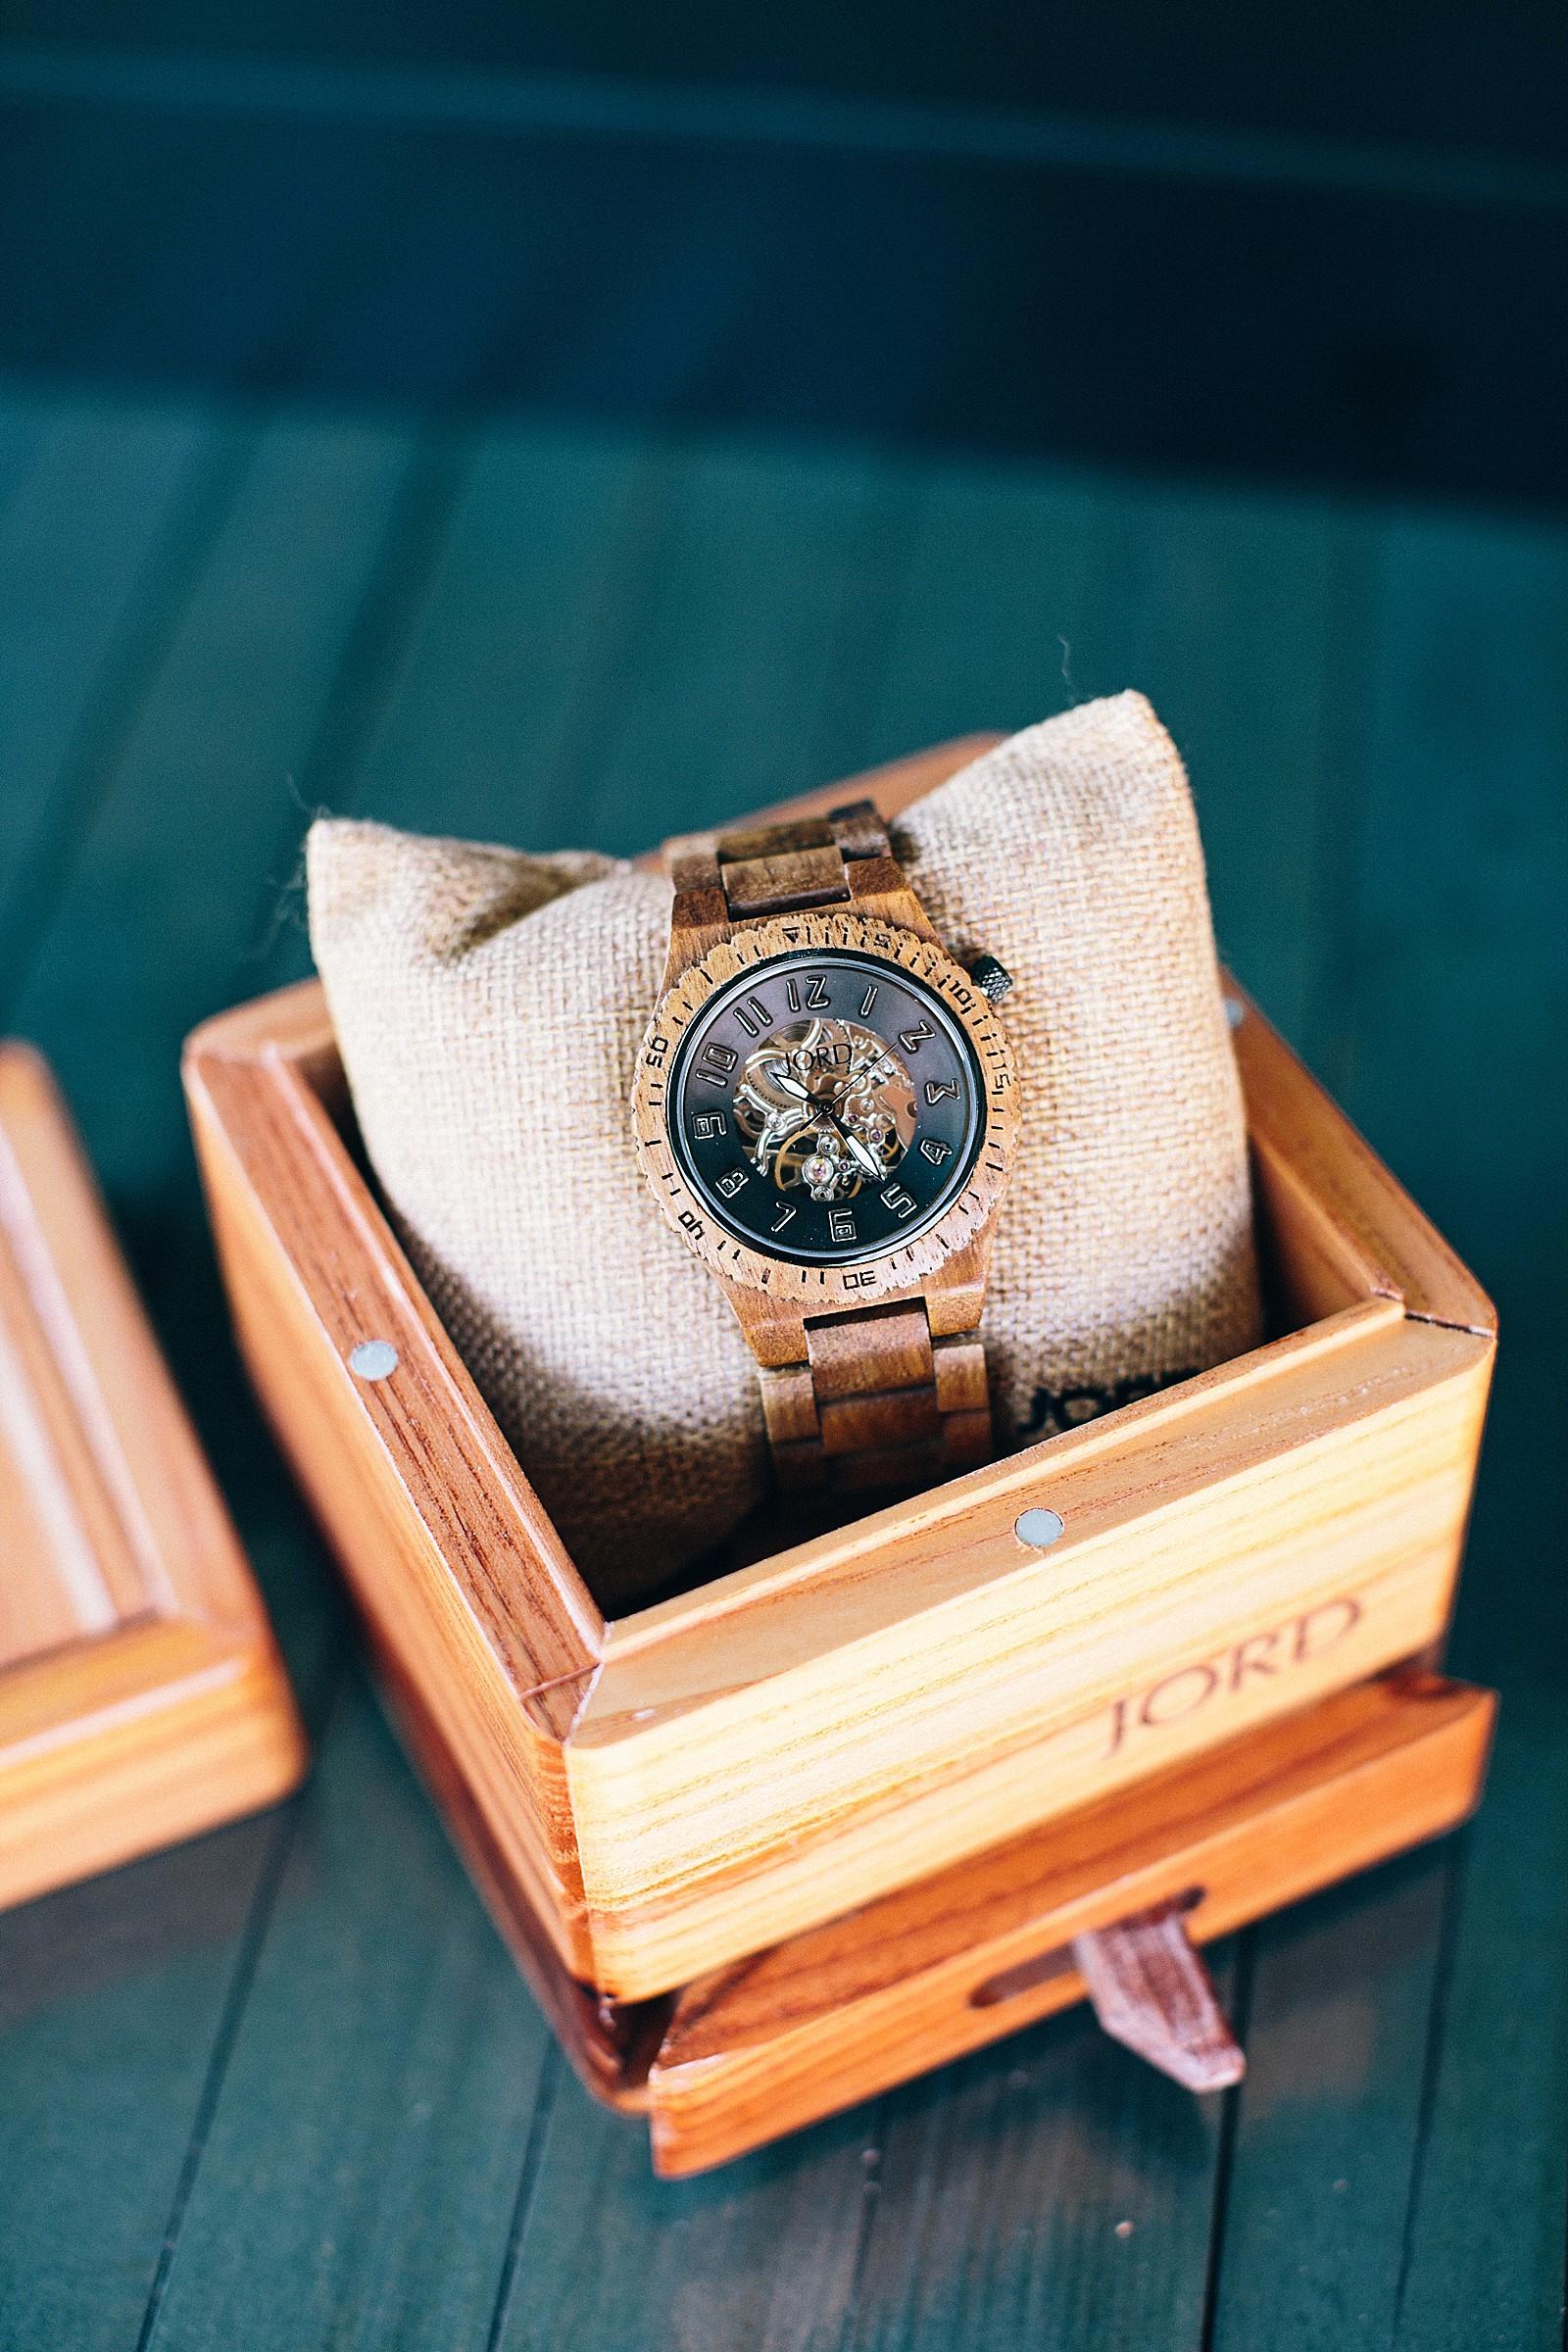 jord-wood-ladies-mens-wood-watch-unique-cool-gift-watch-1346